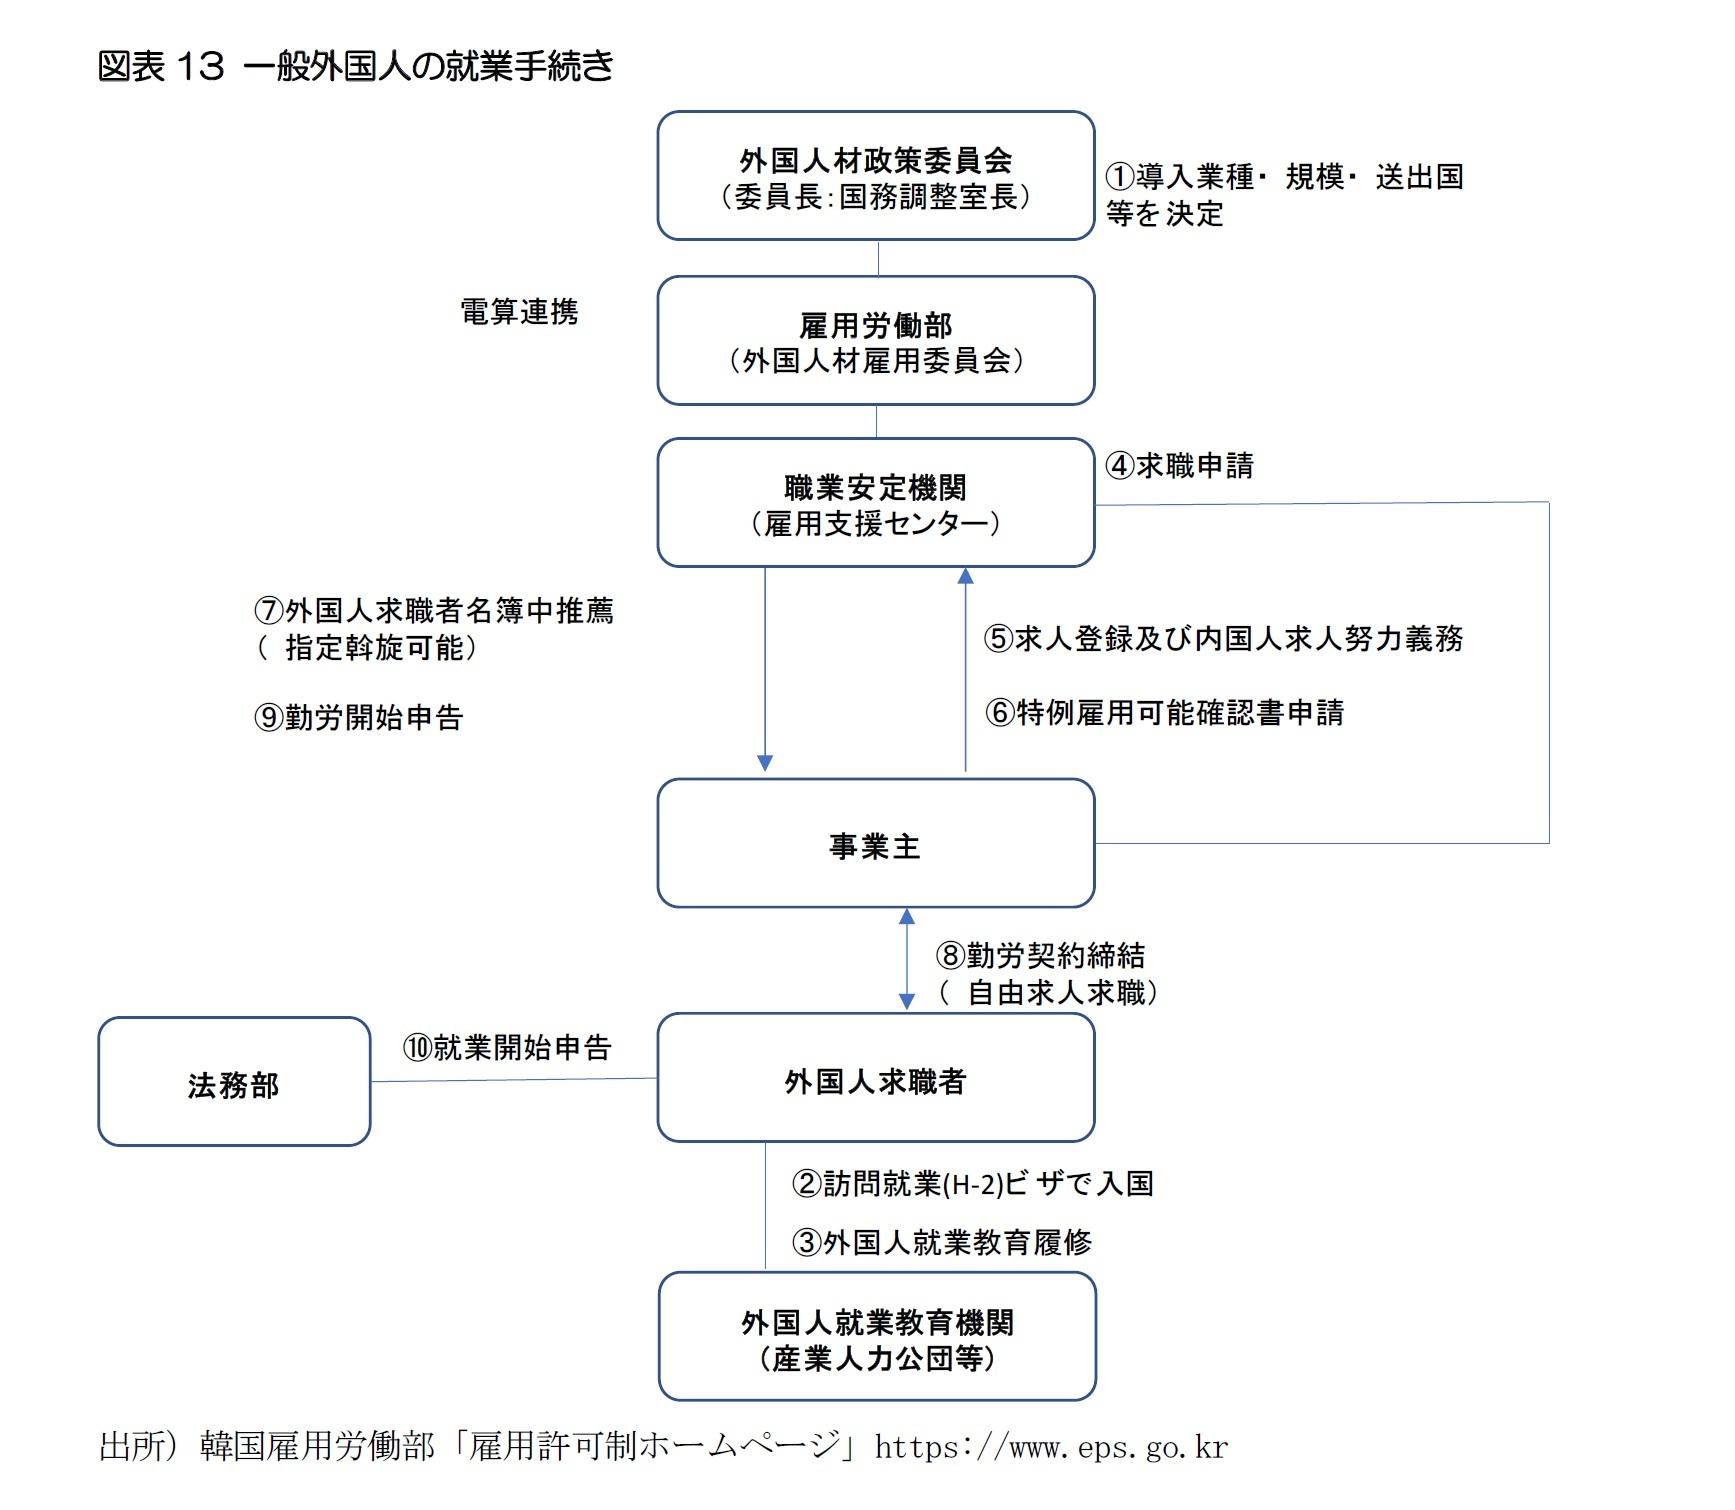 図表13 一般外国人の就業手続き